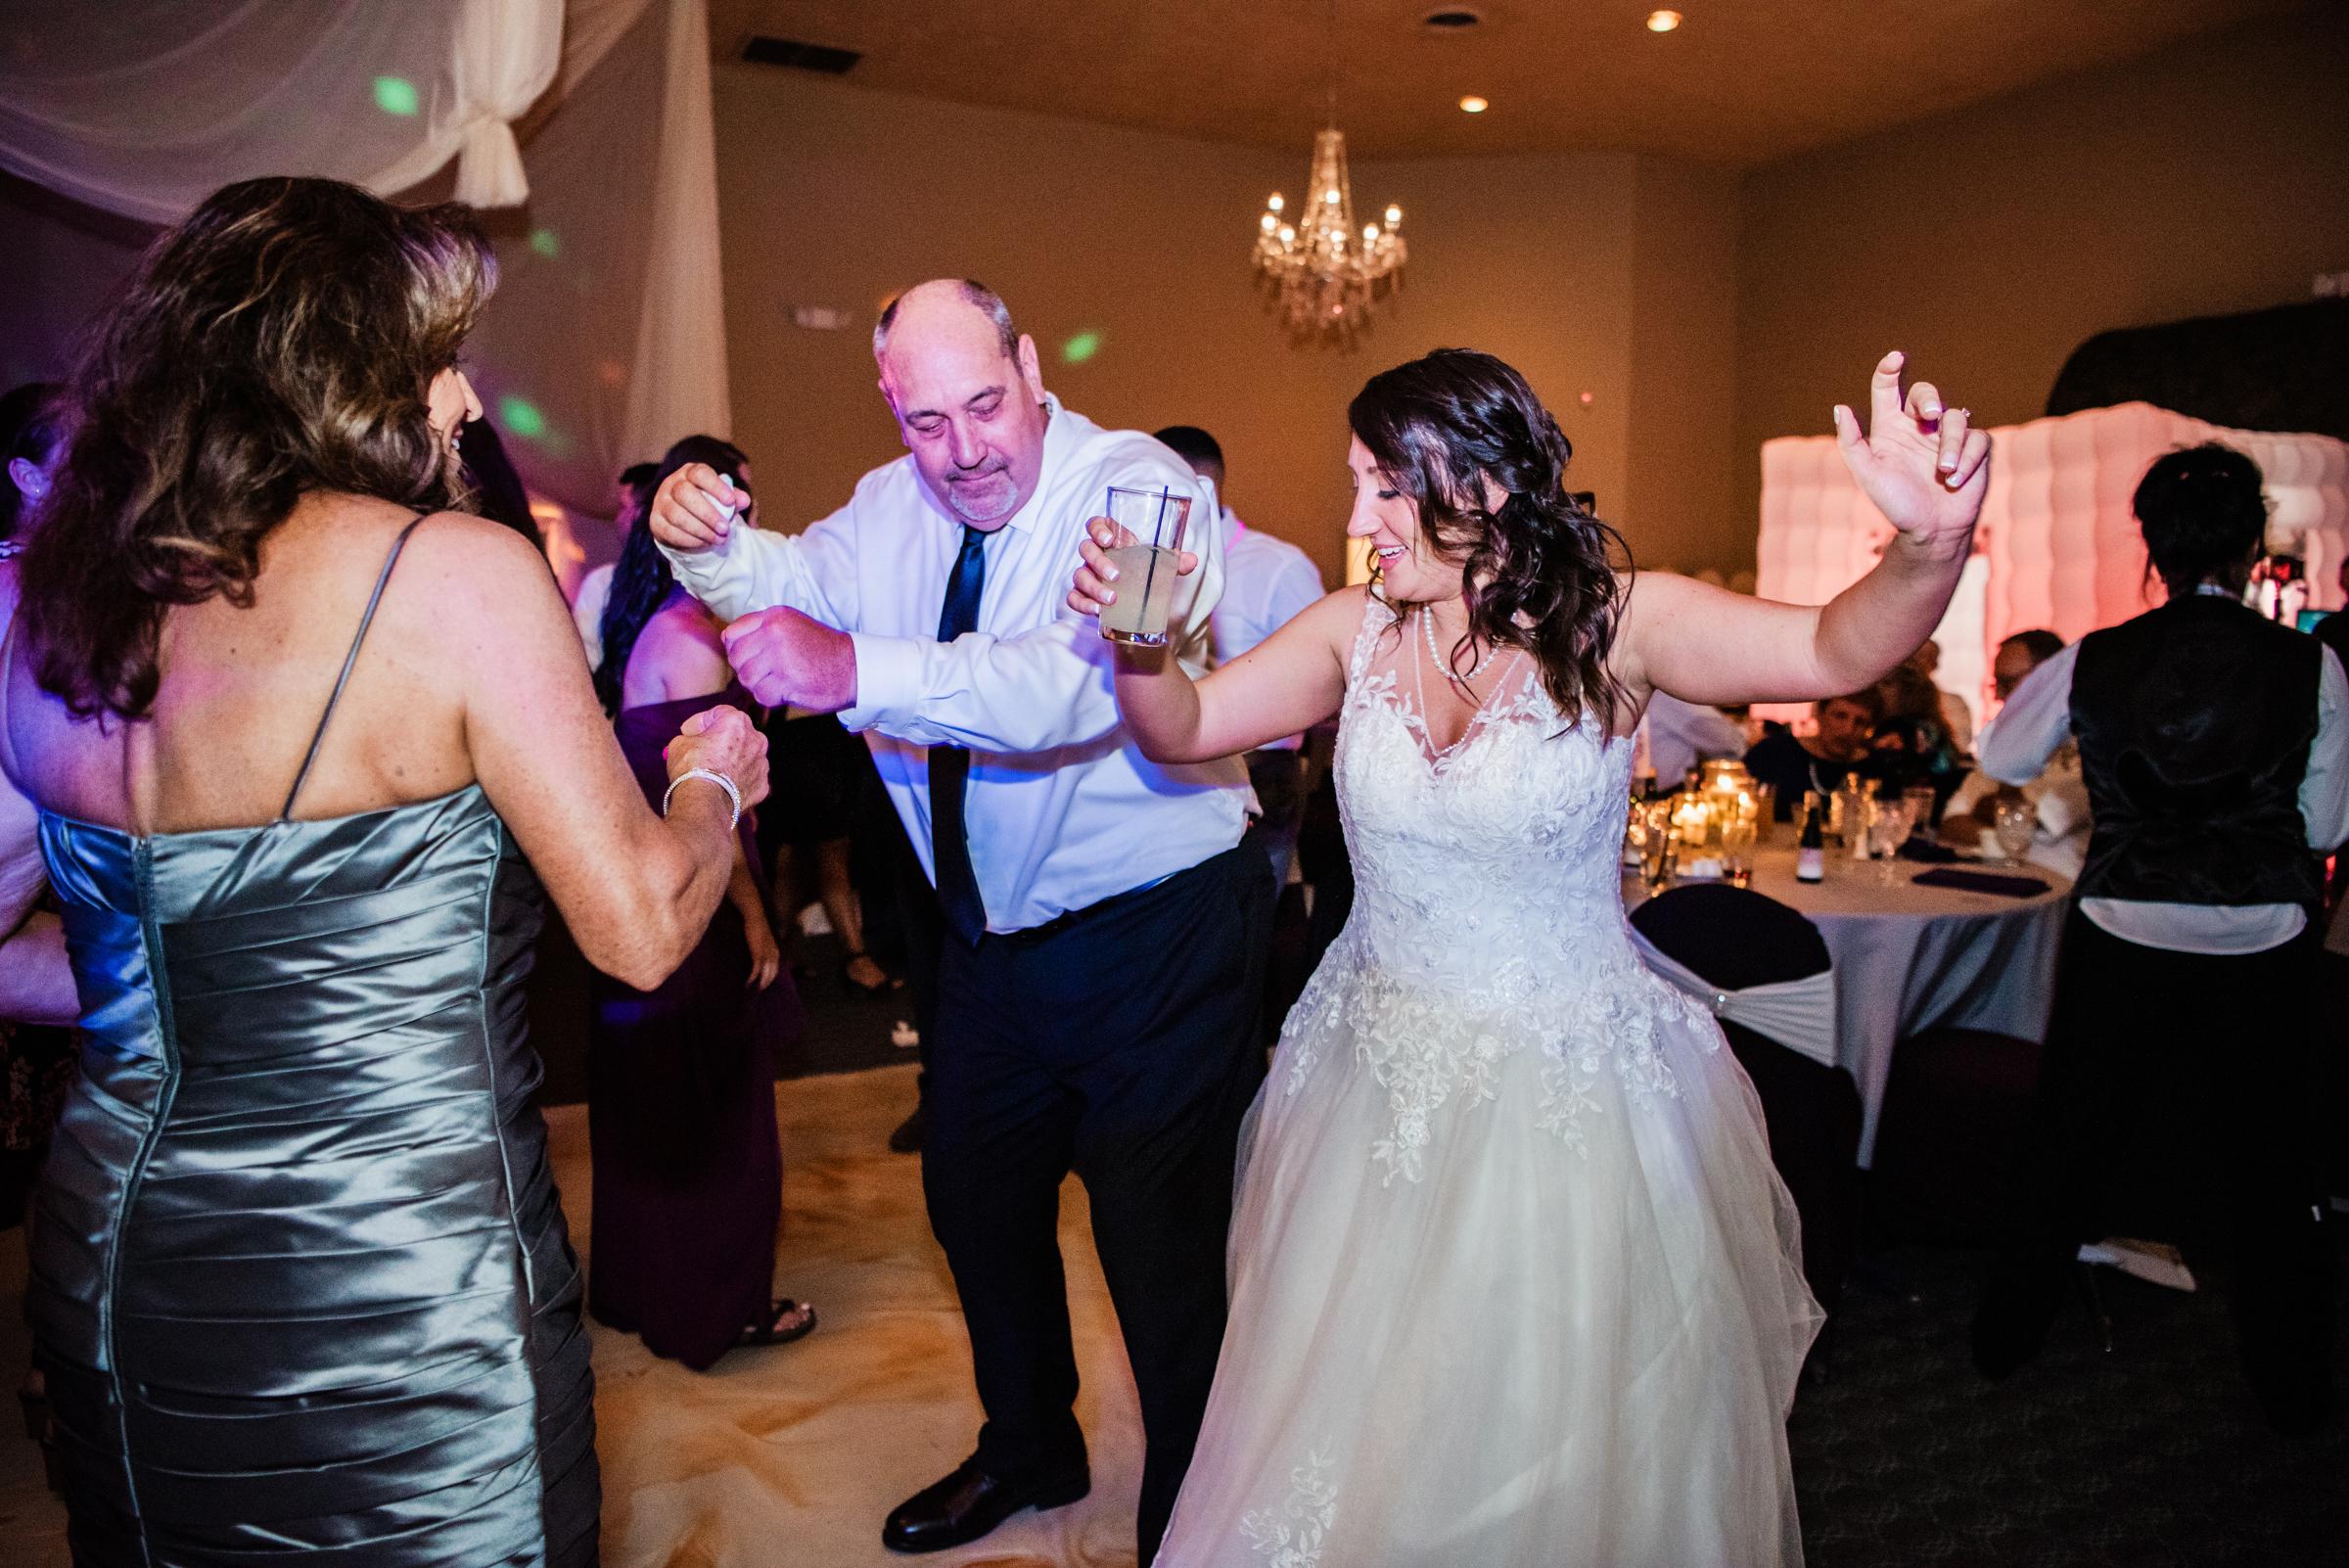 Historic_Old_St_Johns_Church_Valentinos_Banquet_Hall_Central_NY_Wedding_JILL_STUDIO_Rochester_NY_Photographer_DSC_7098.jpg